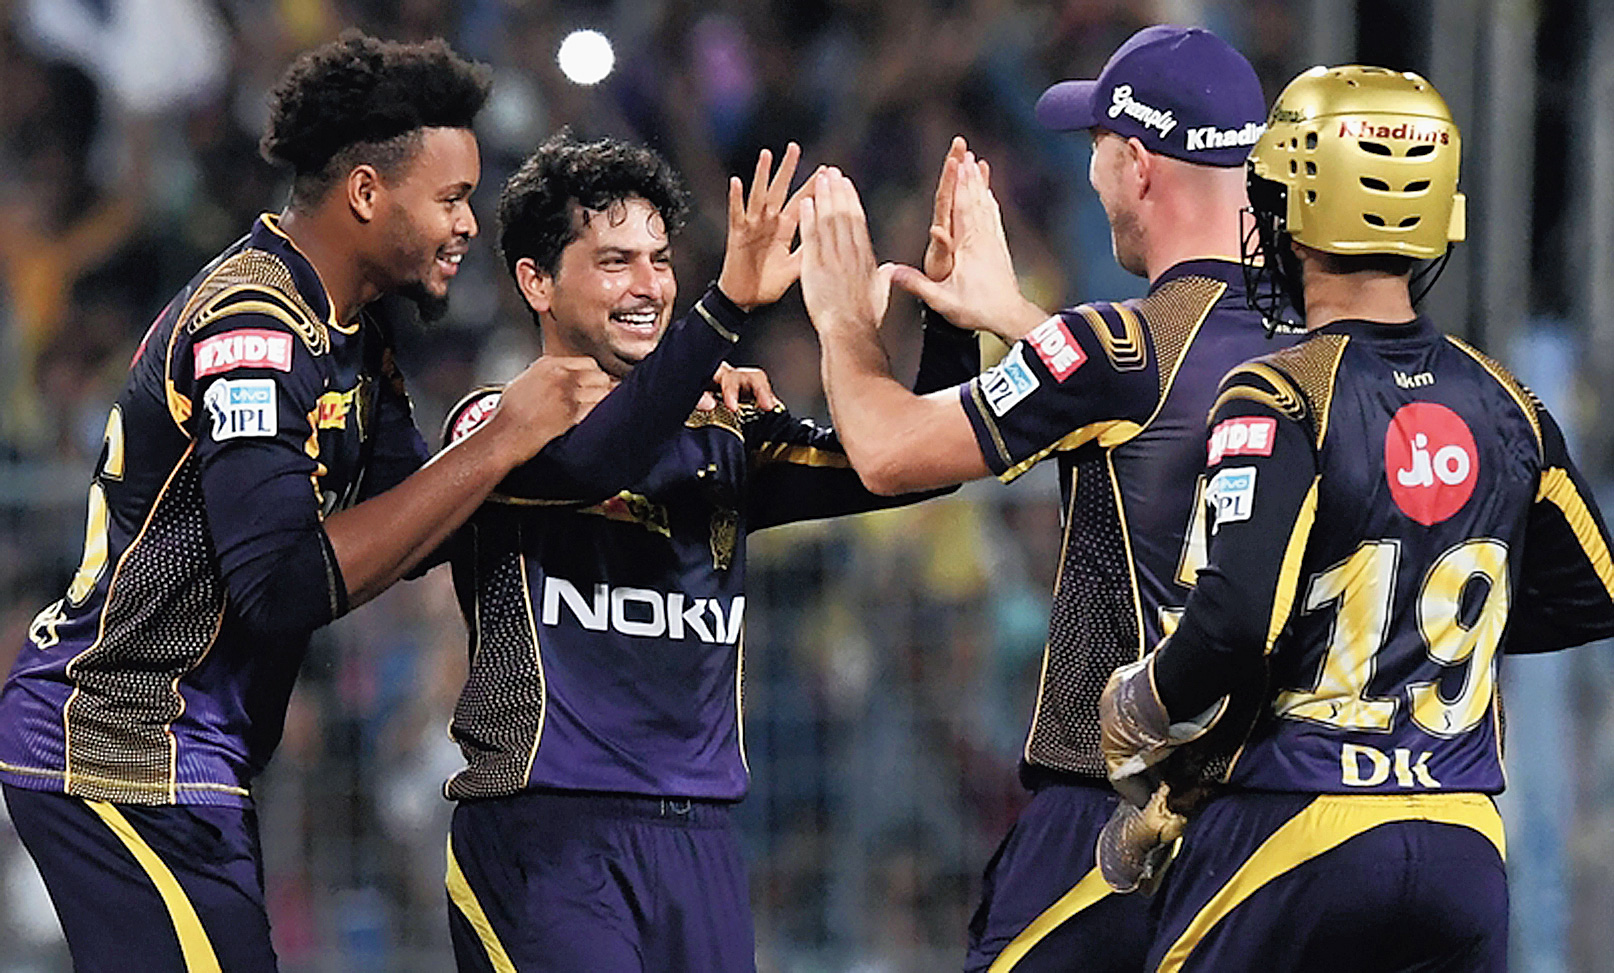 Kolkata Knight Riders during the IPL 2018 Eliminator against Rajasthan Royals.